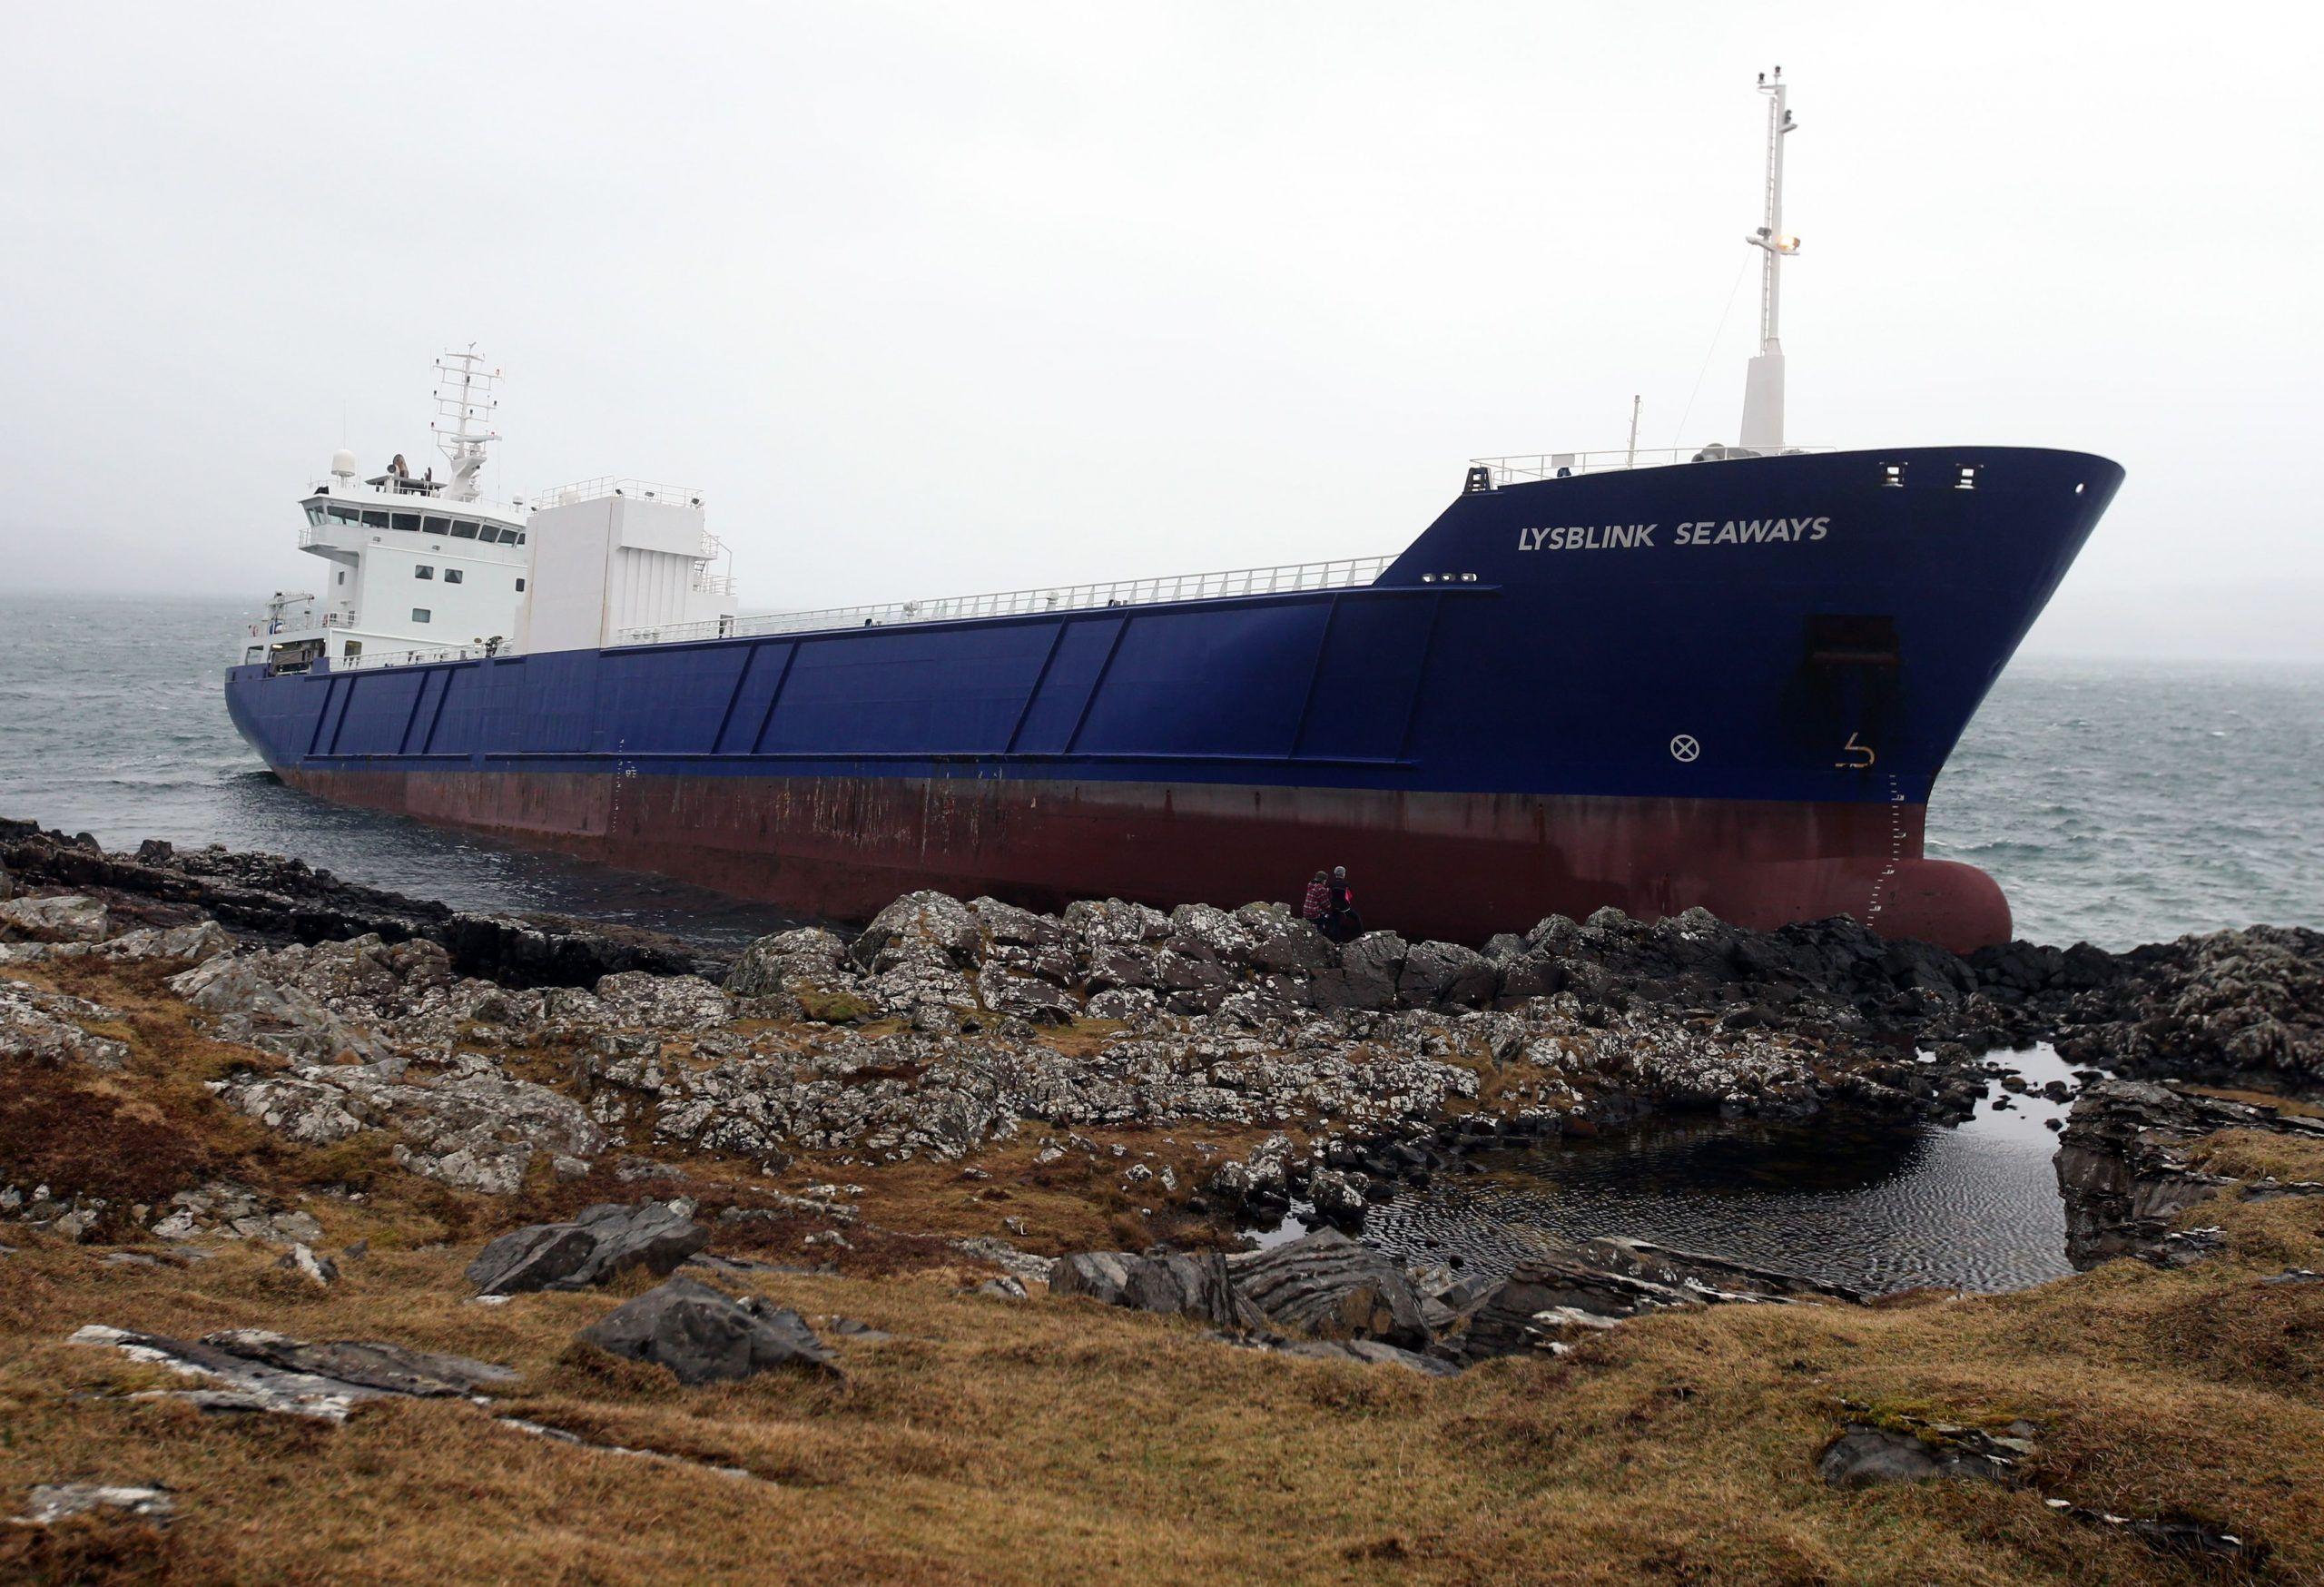 Container ship runs aground